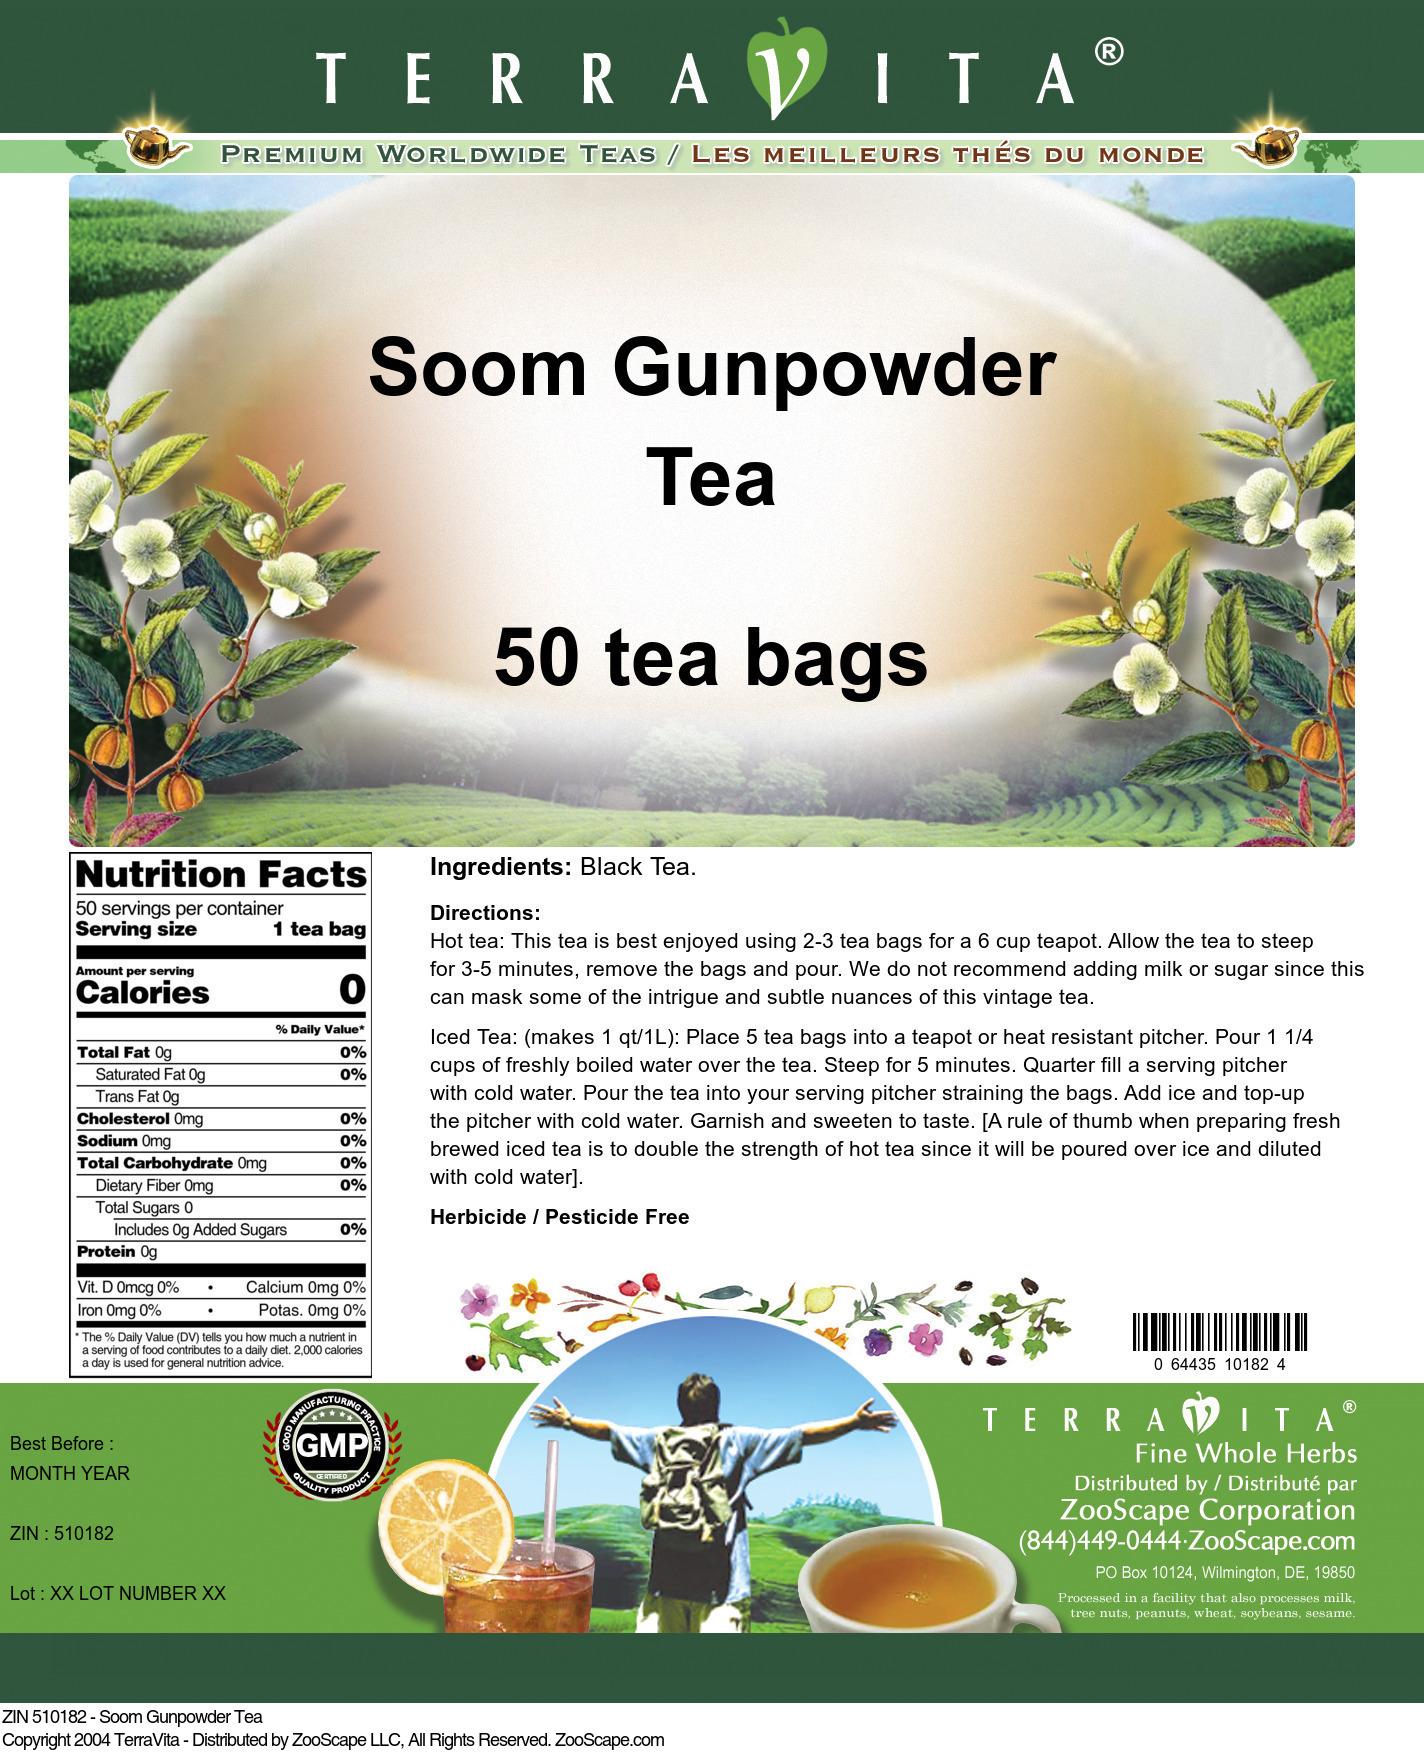 Soom Gunpowder Tea